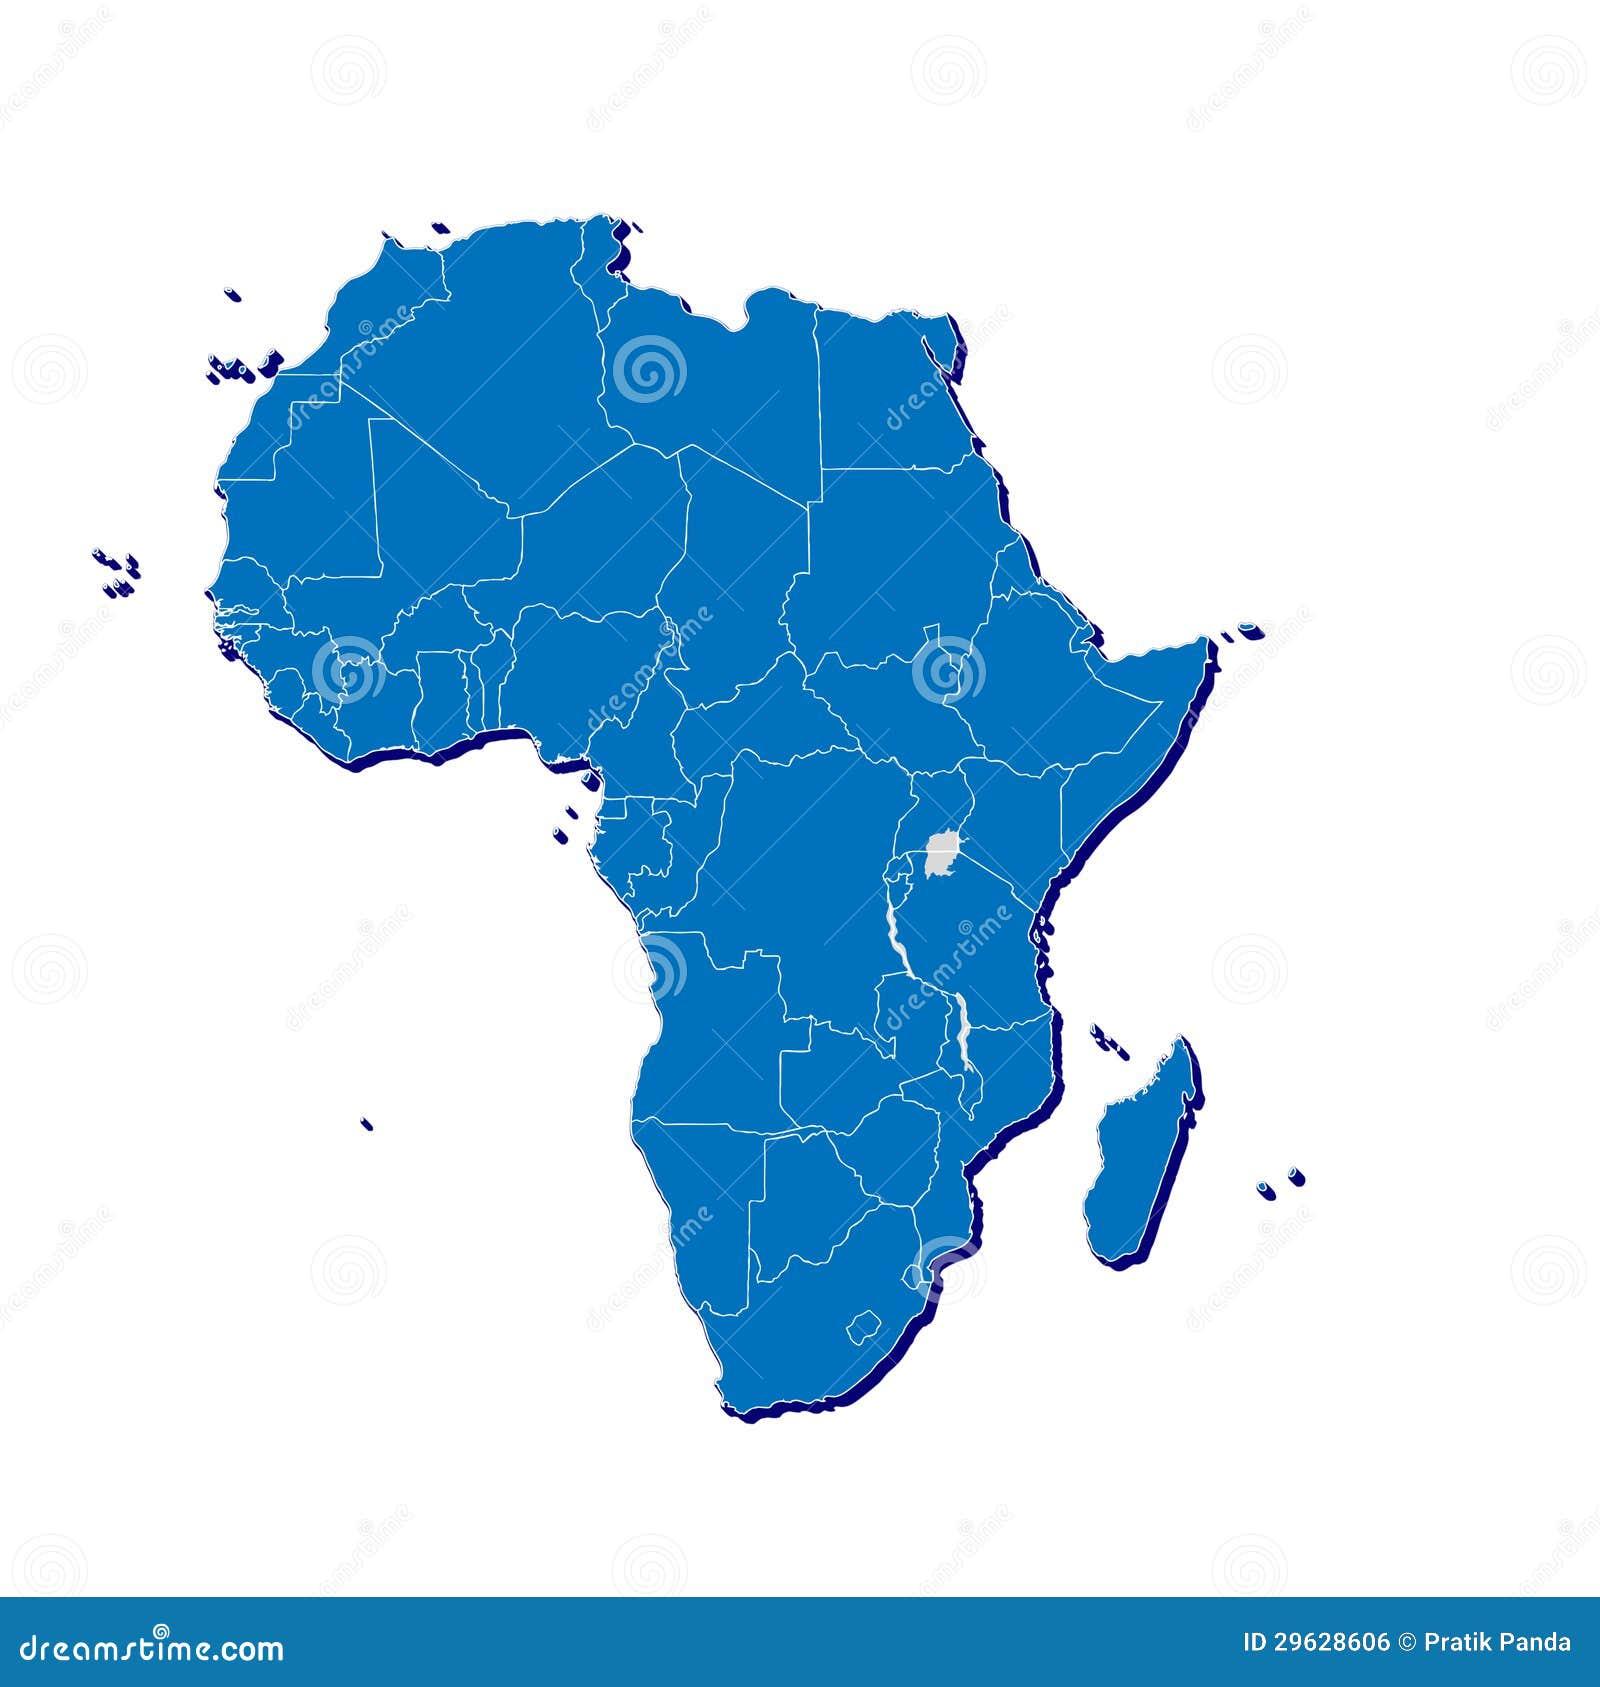 Afrika-Karte in 3D